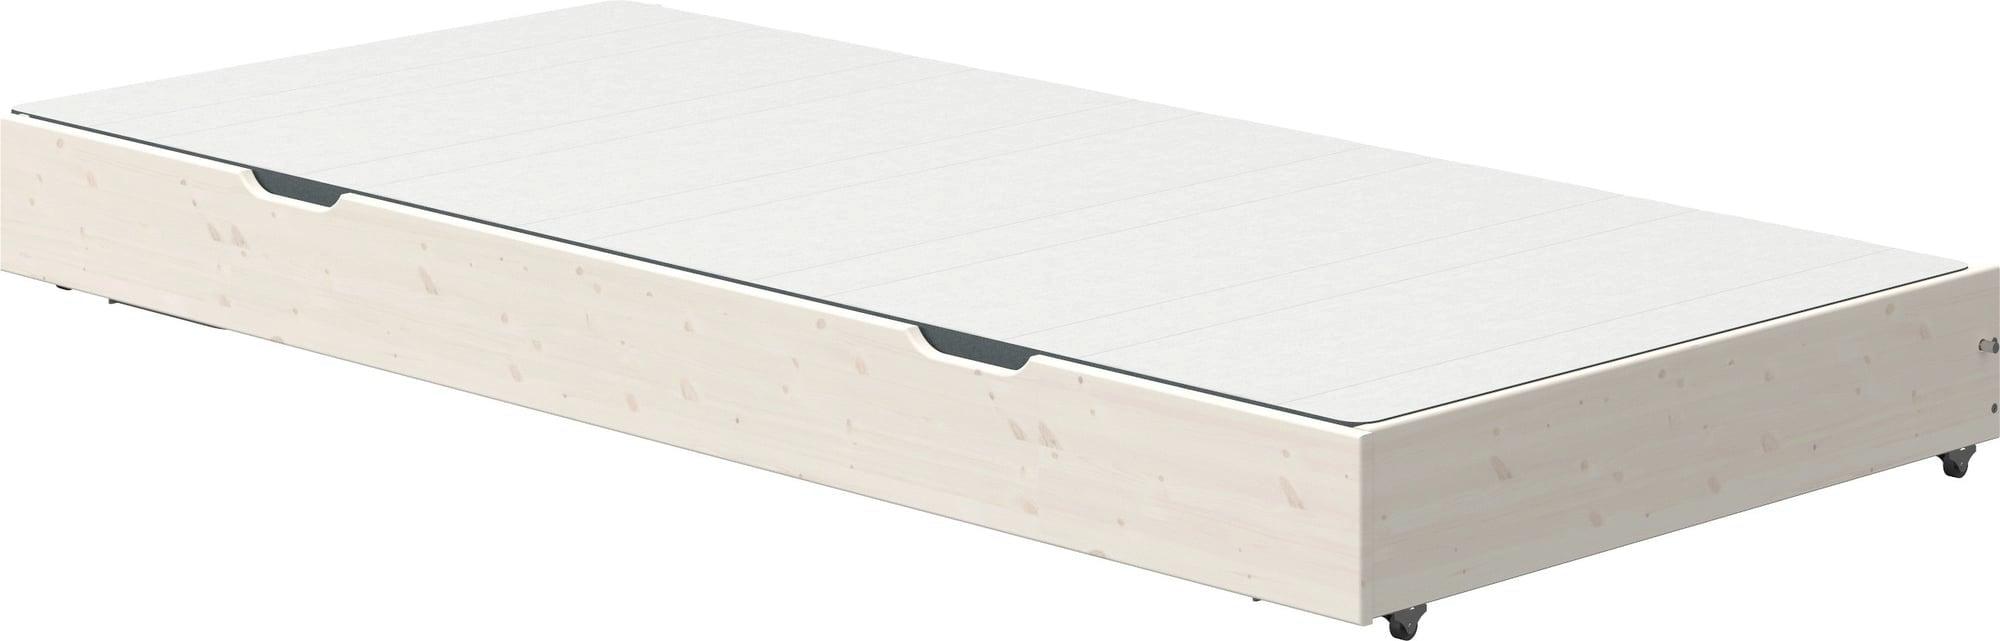 Full Size of Bett Ausklappbar Zum Doppelbett Ikea 180x200 Ausklappbares Englisch Wand Klappbar Stauraum Ausklappen Mit Schrank Wandbefestigung Sofa Selber Bauen Flexa Bett Bett Ausklappbar